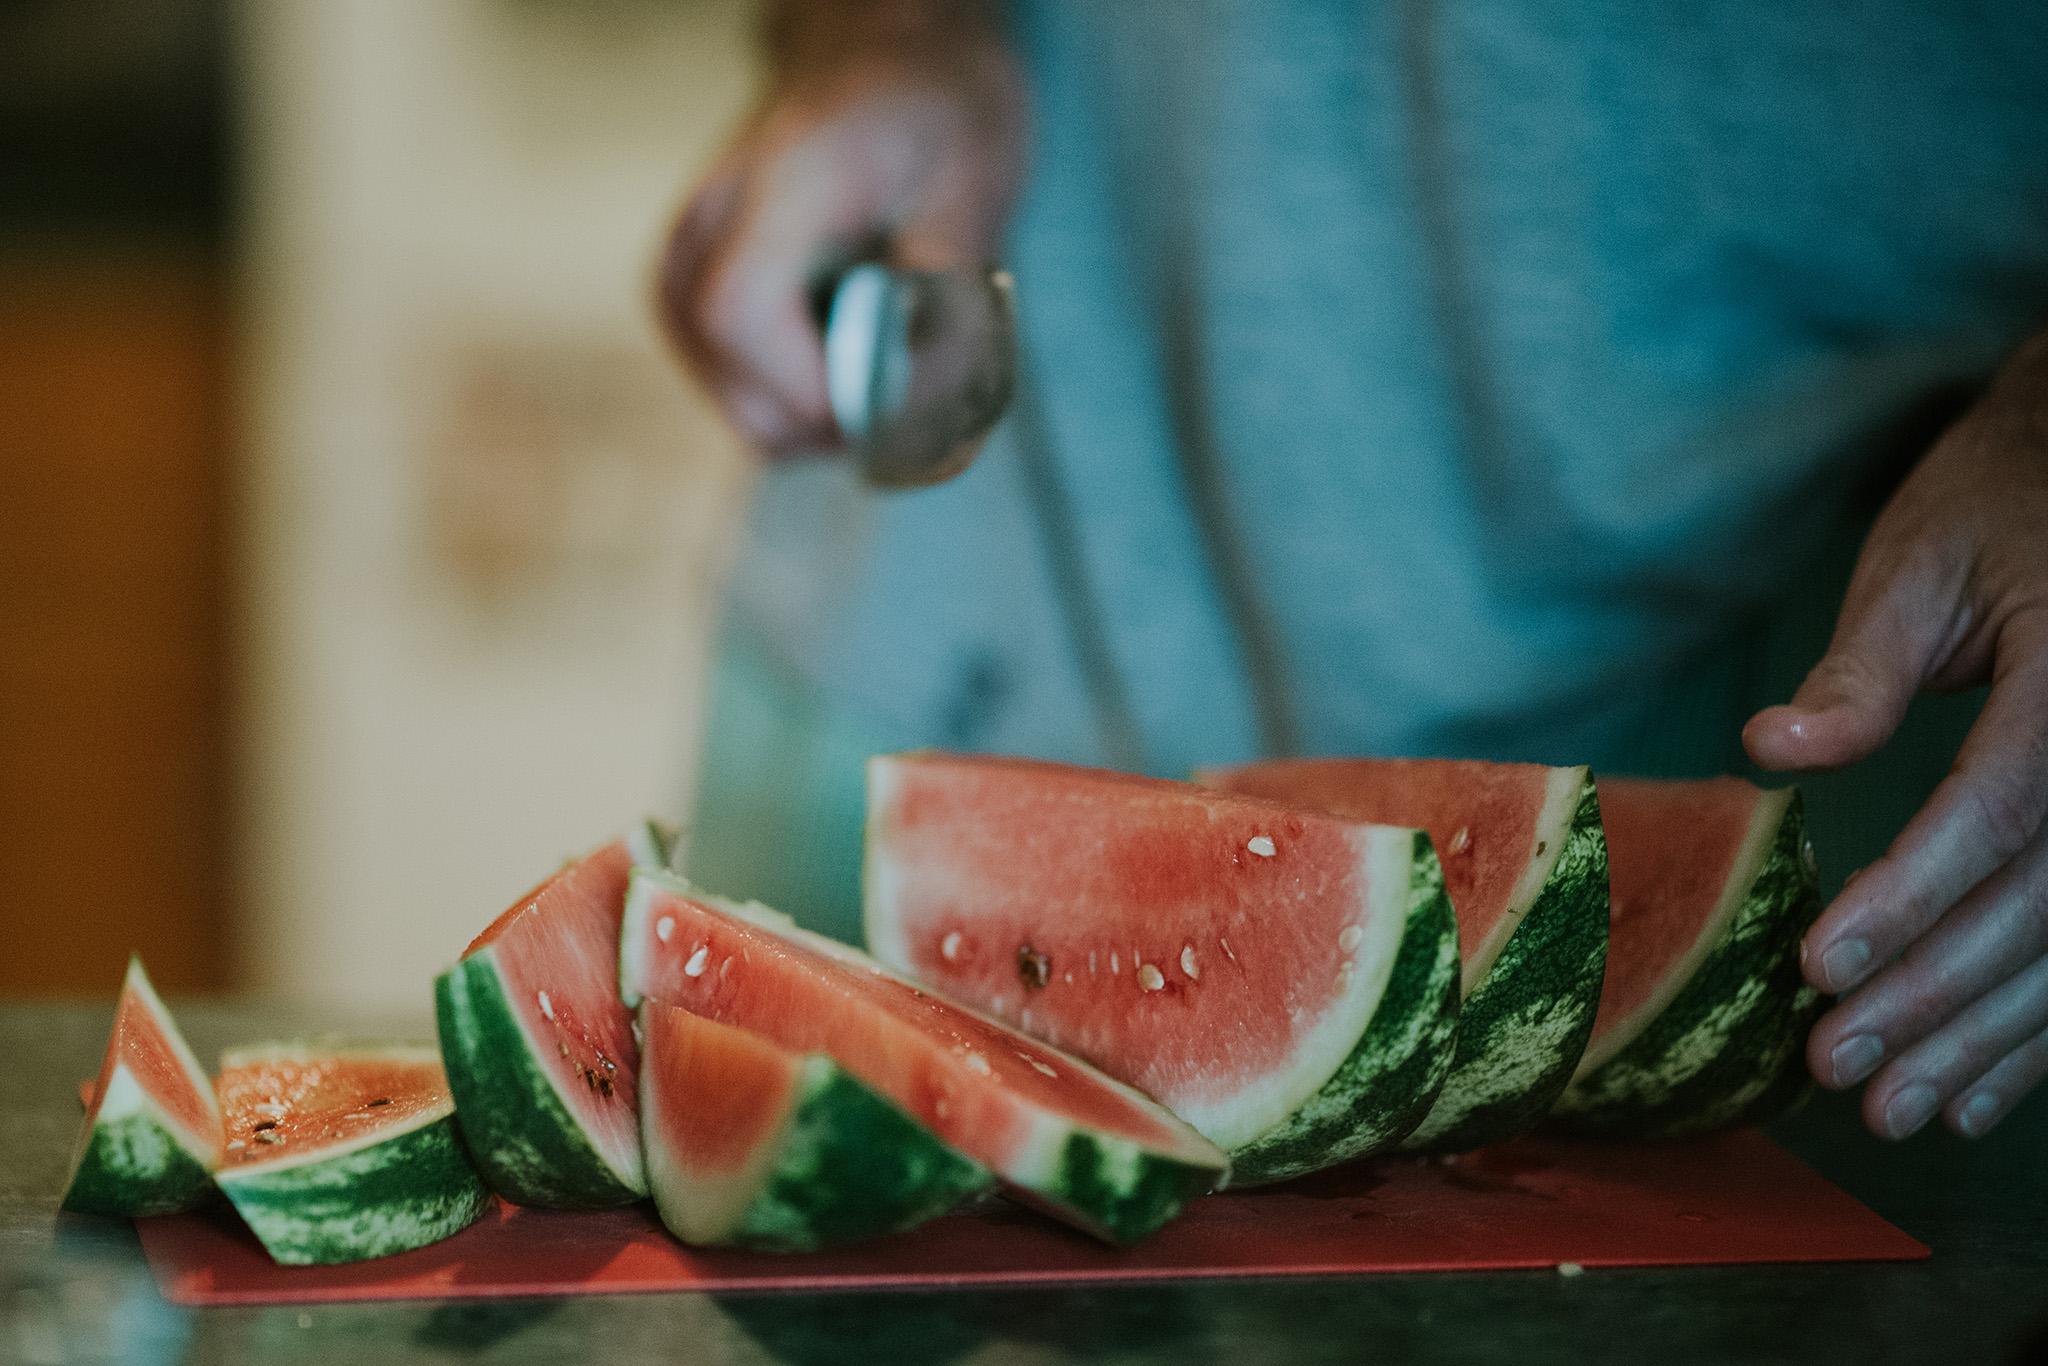 October 10: The last CSA watermelon.